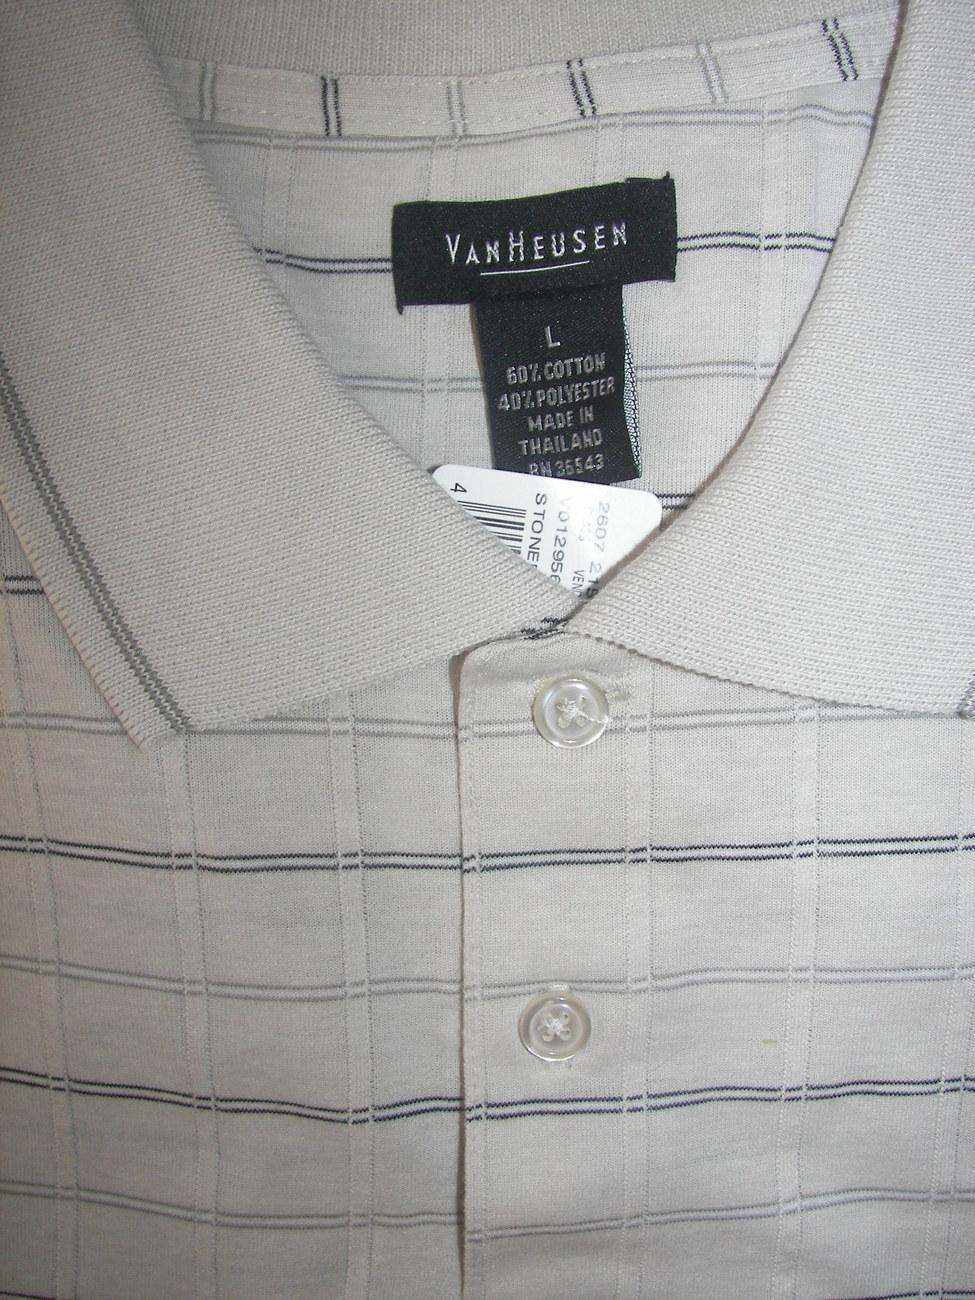 Van Heusen Mens Golf Polo Shirt NEW Stoney Silver